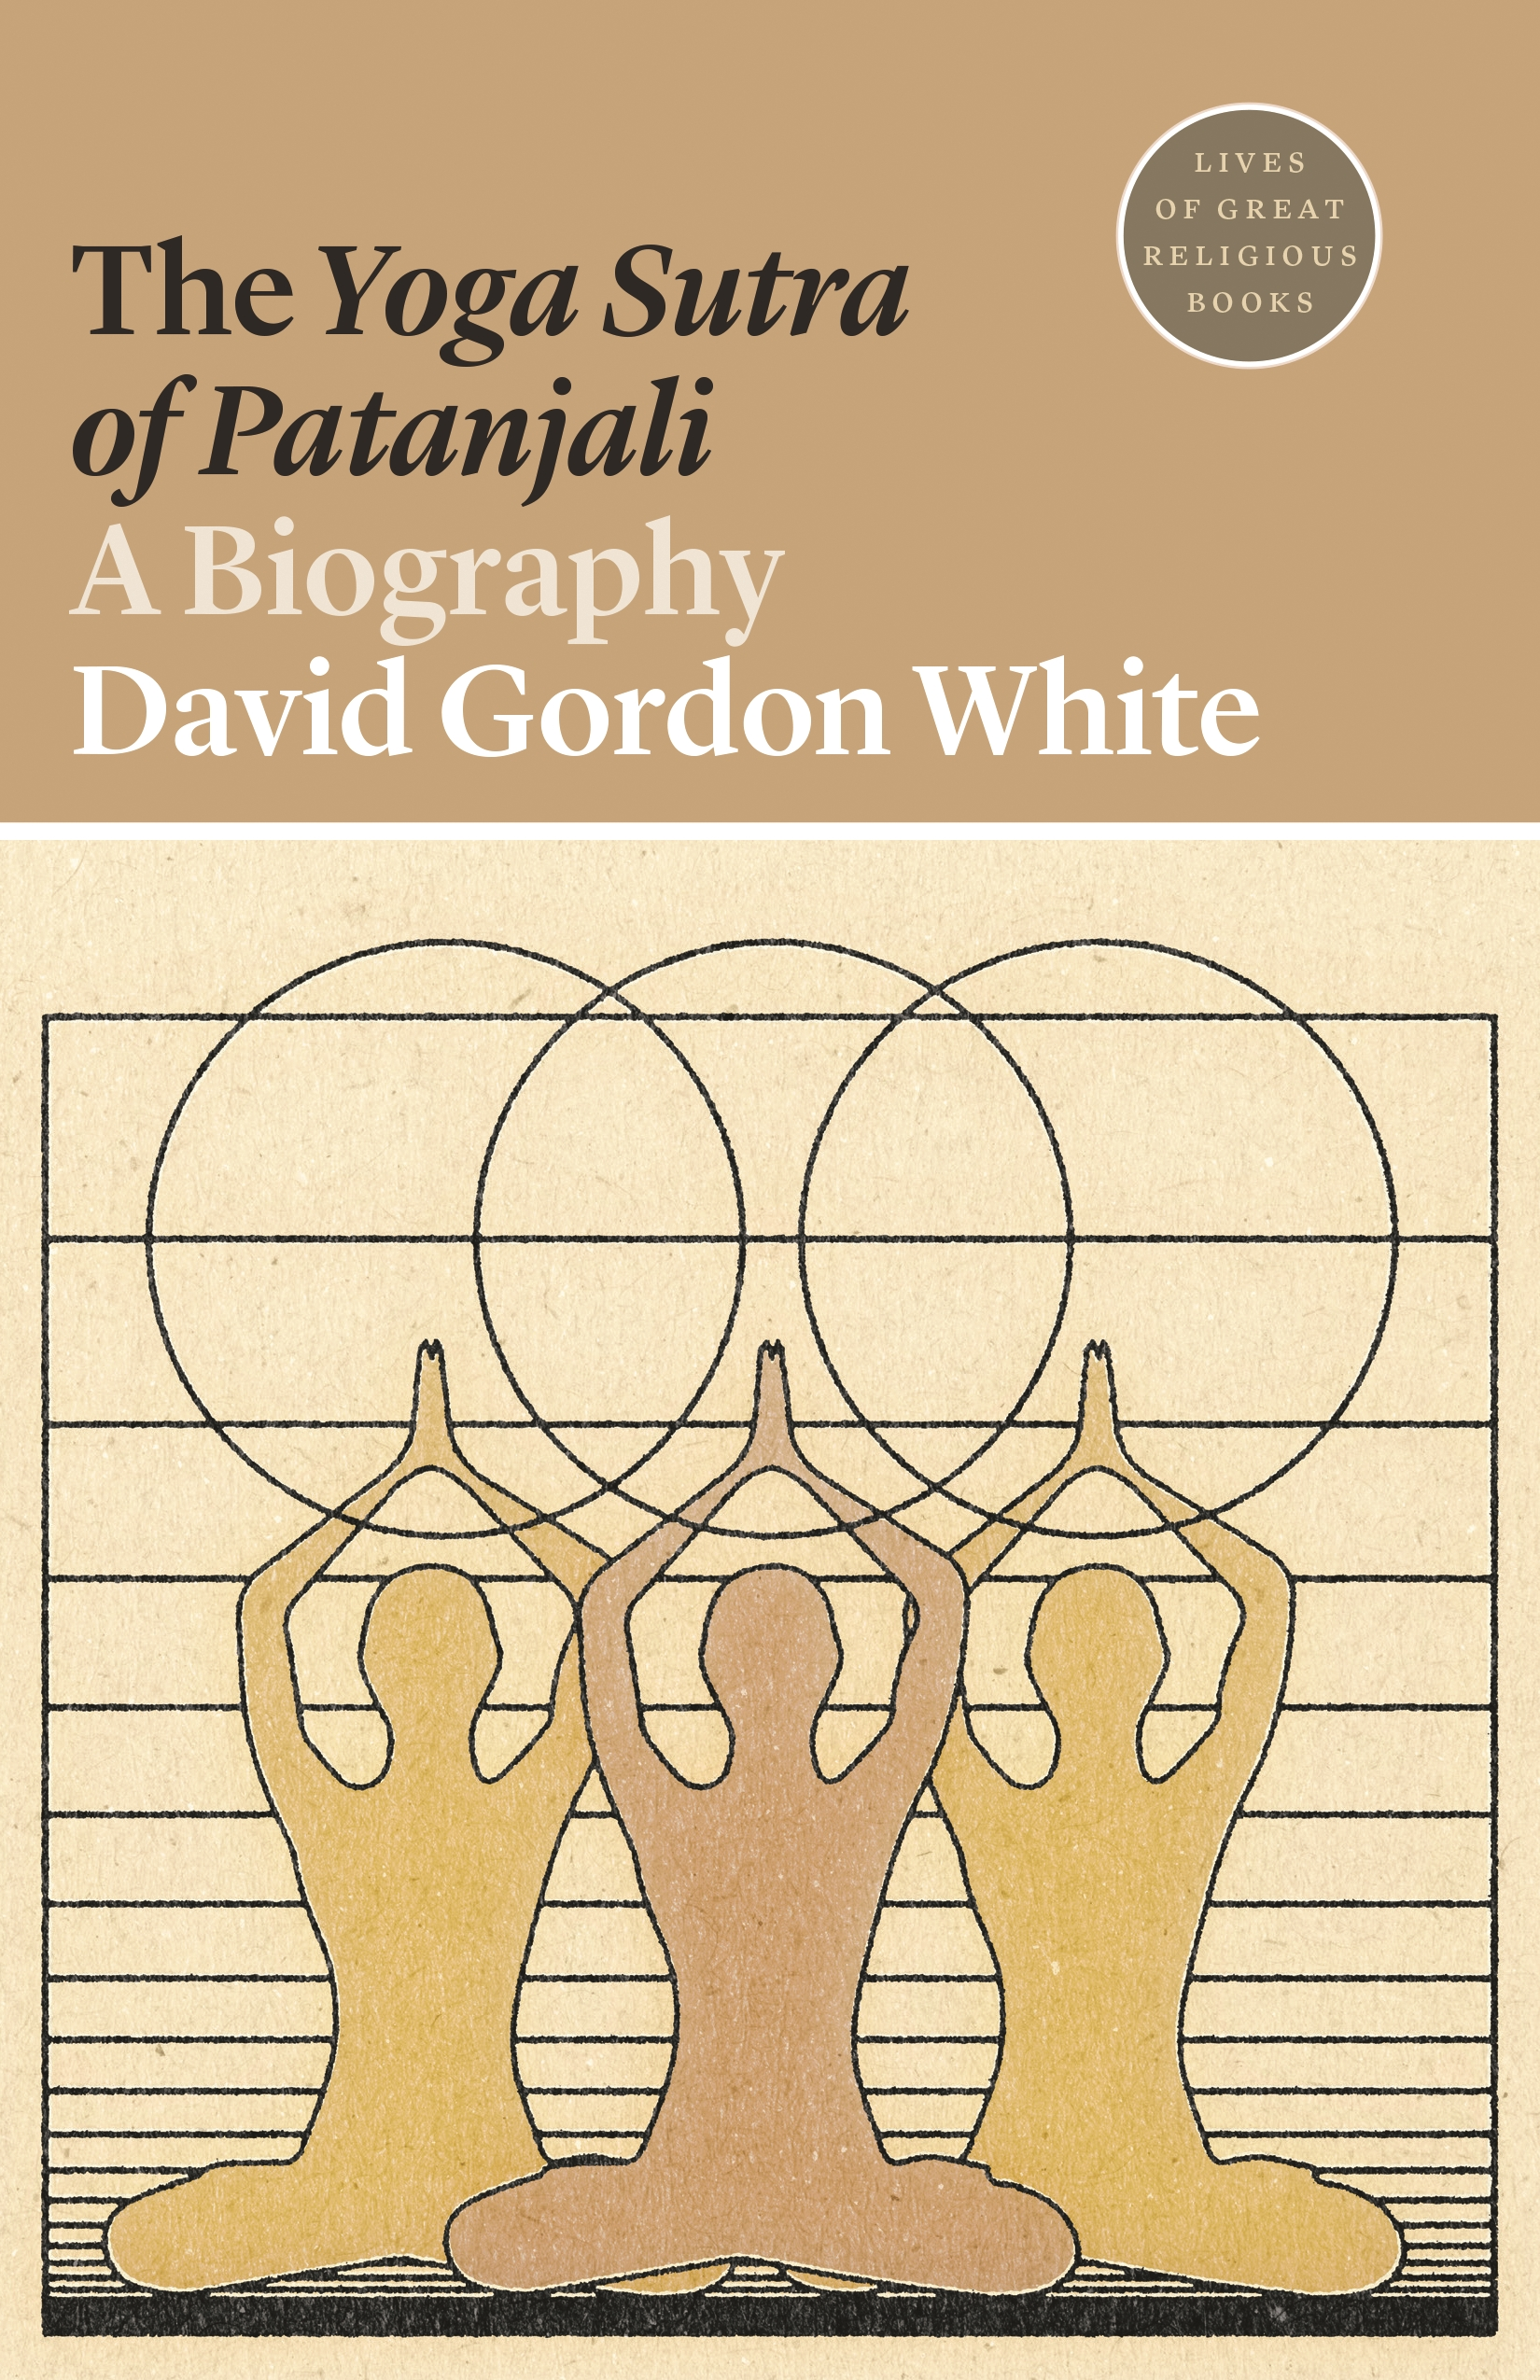 The Yoga Sutra Of Patanjali Princeton University Press